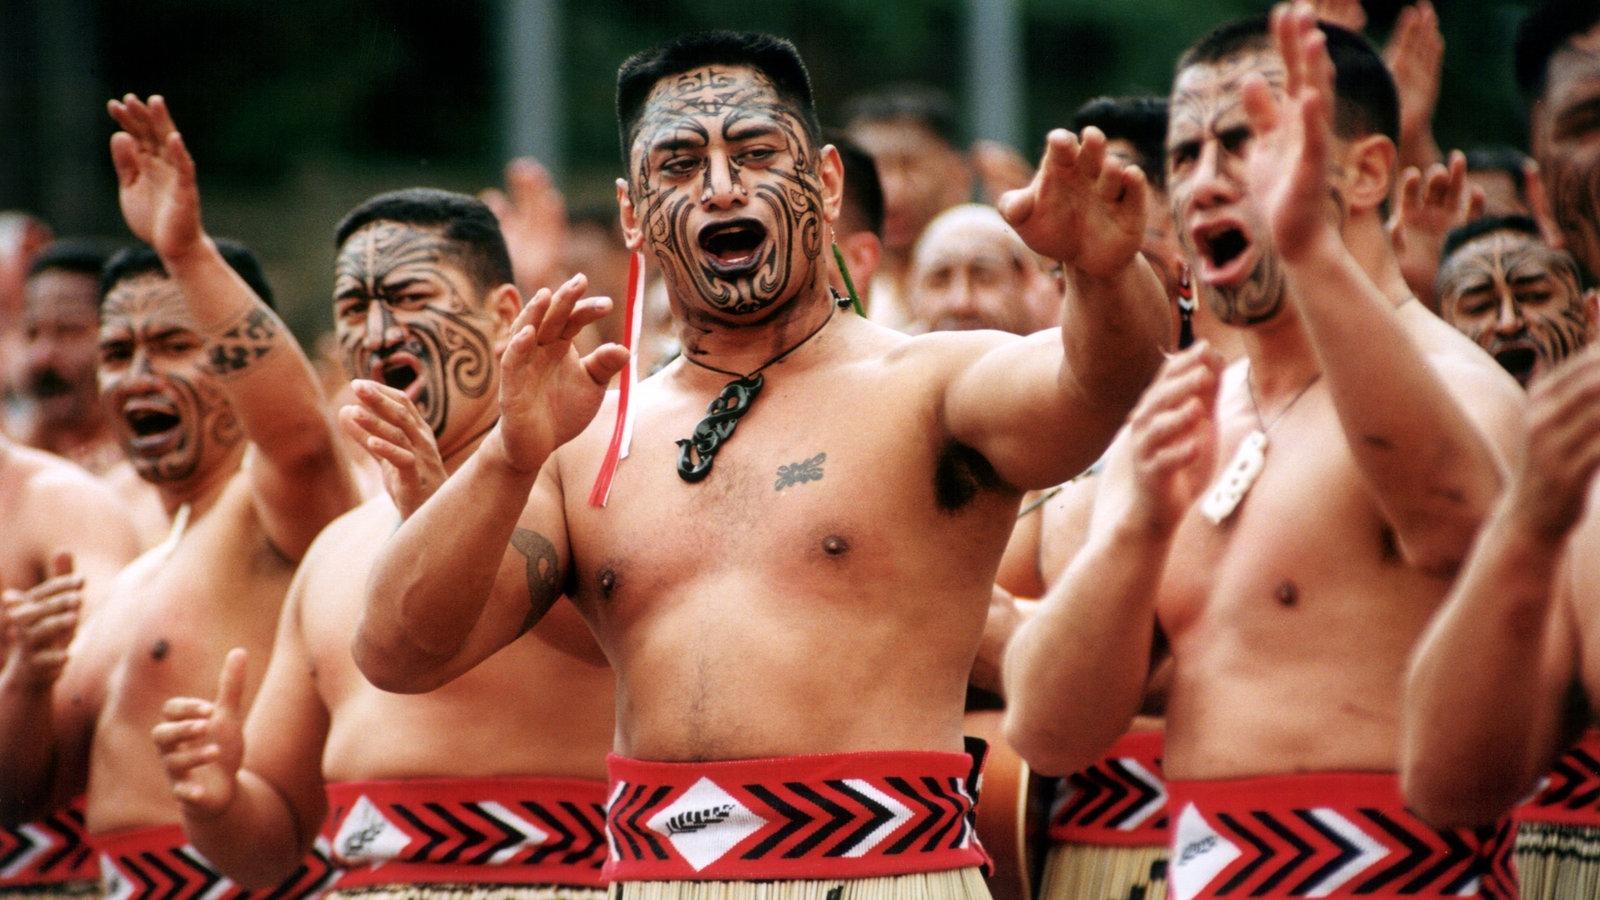 Captivating Maori Krieger Ideas Of